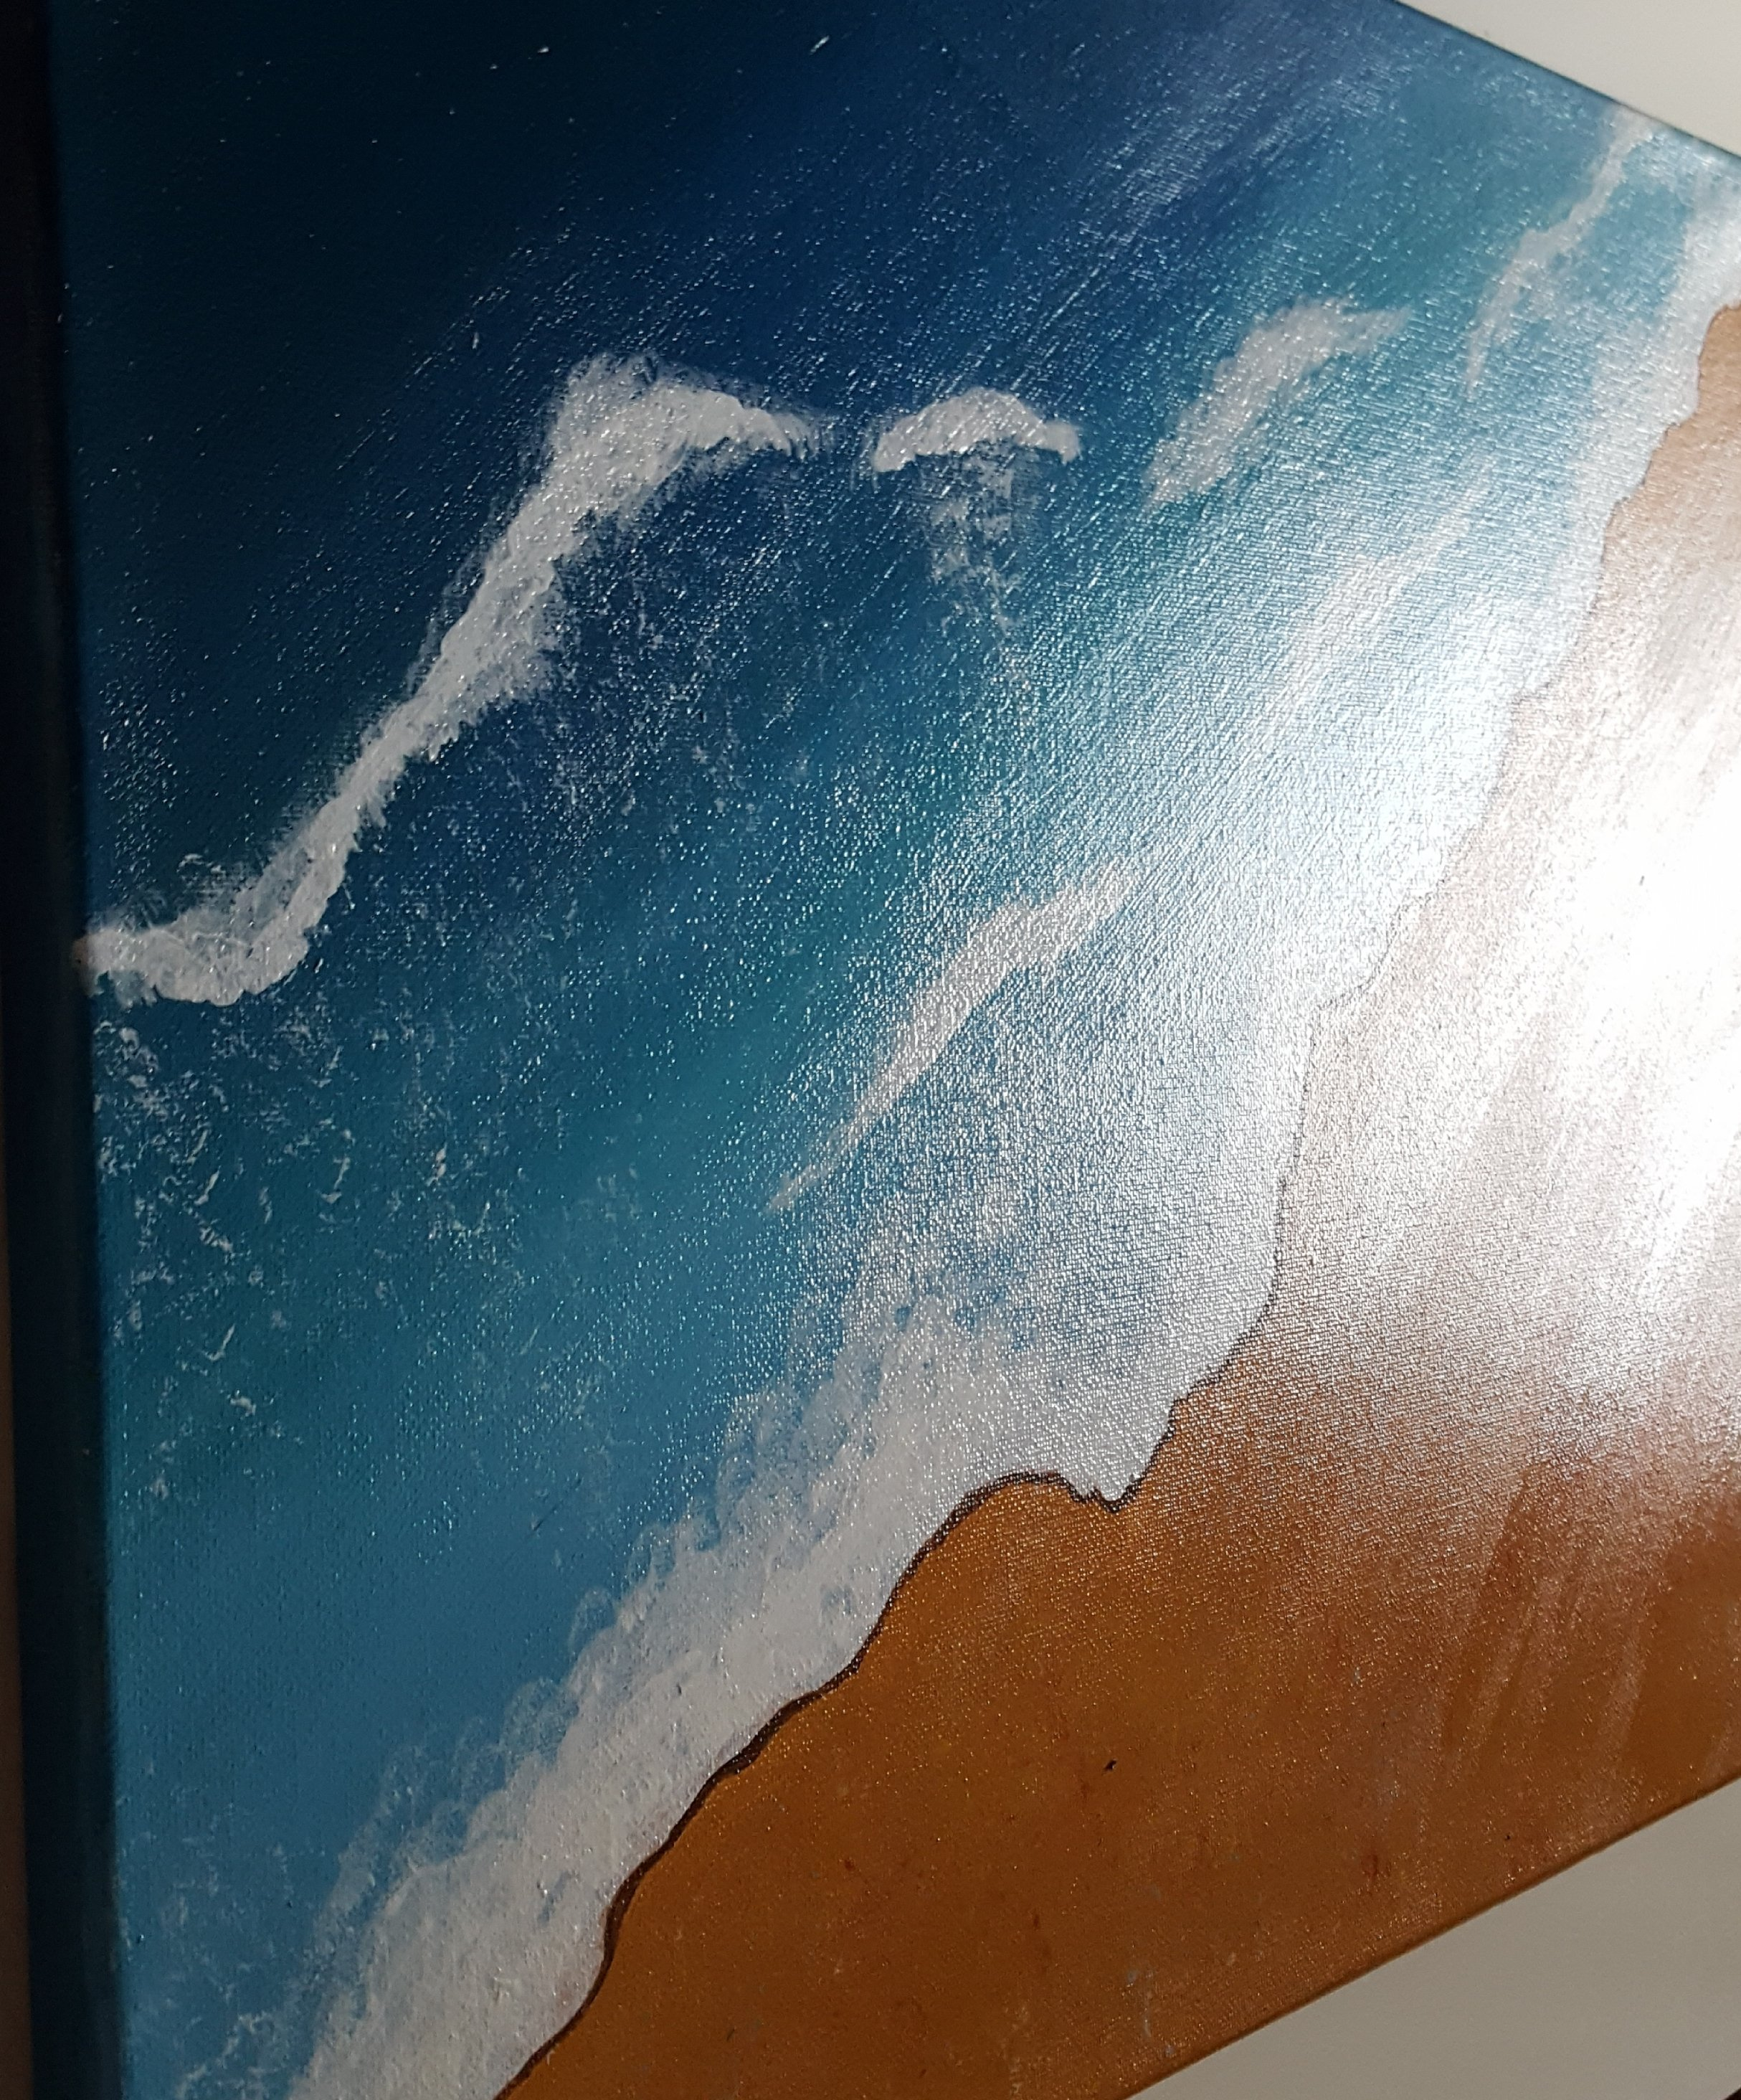 Land & Meer 2   Acryl Gemälde auf Keilrahmen 40x50 cm 2cm Höhe .  Signatur Sarah Jade S.J